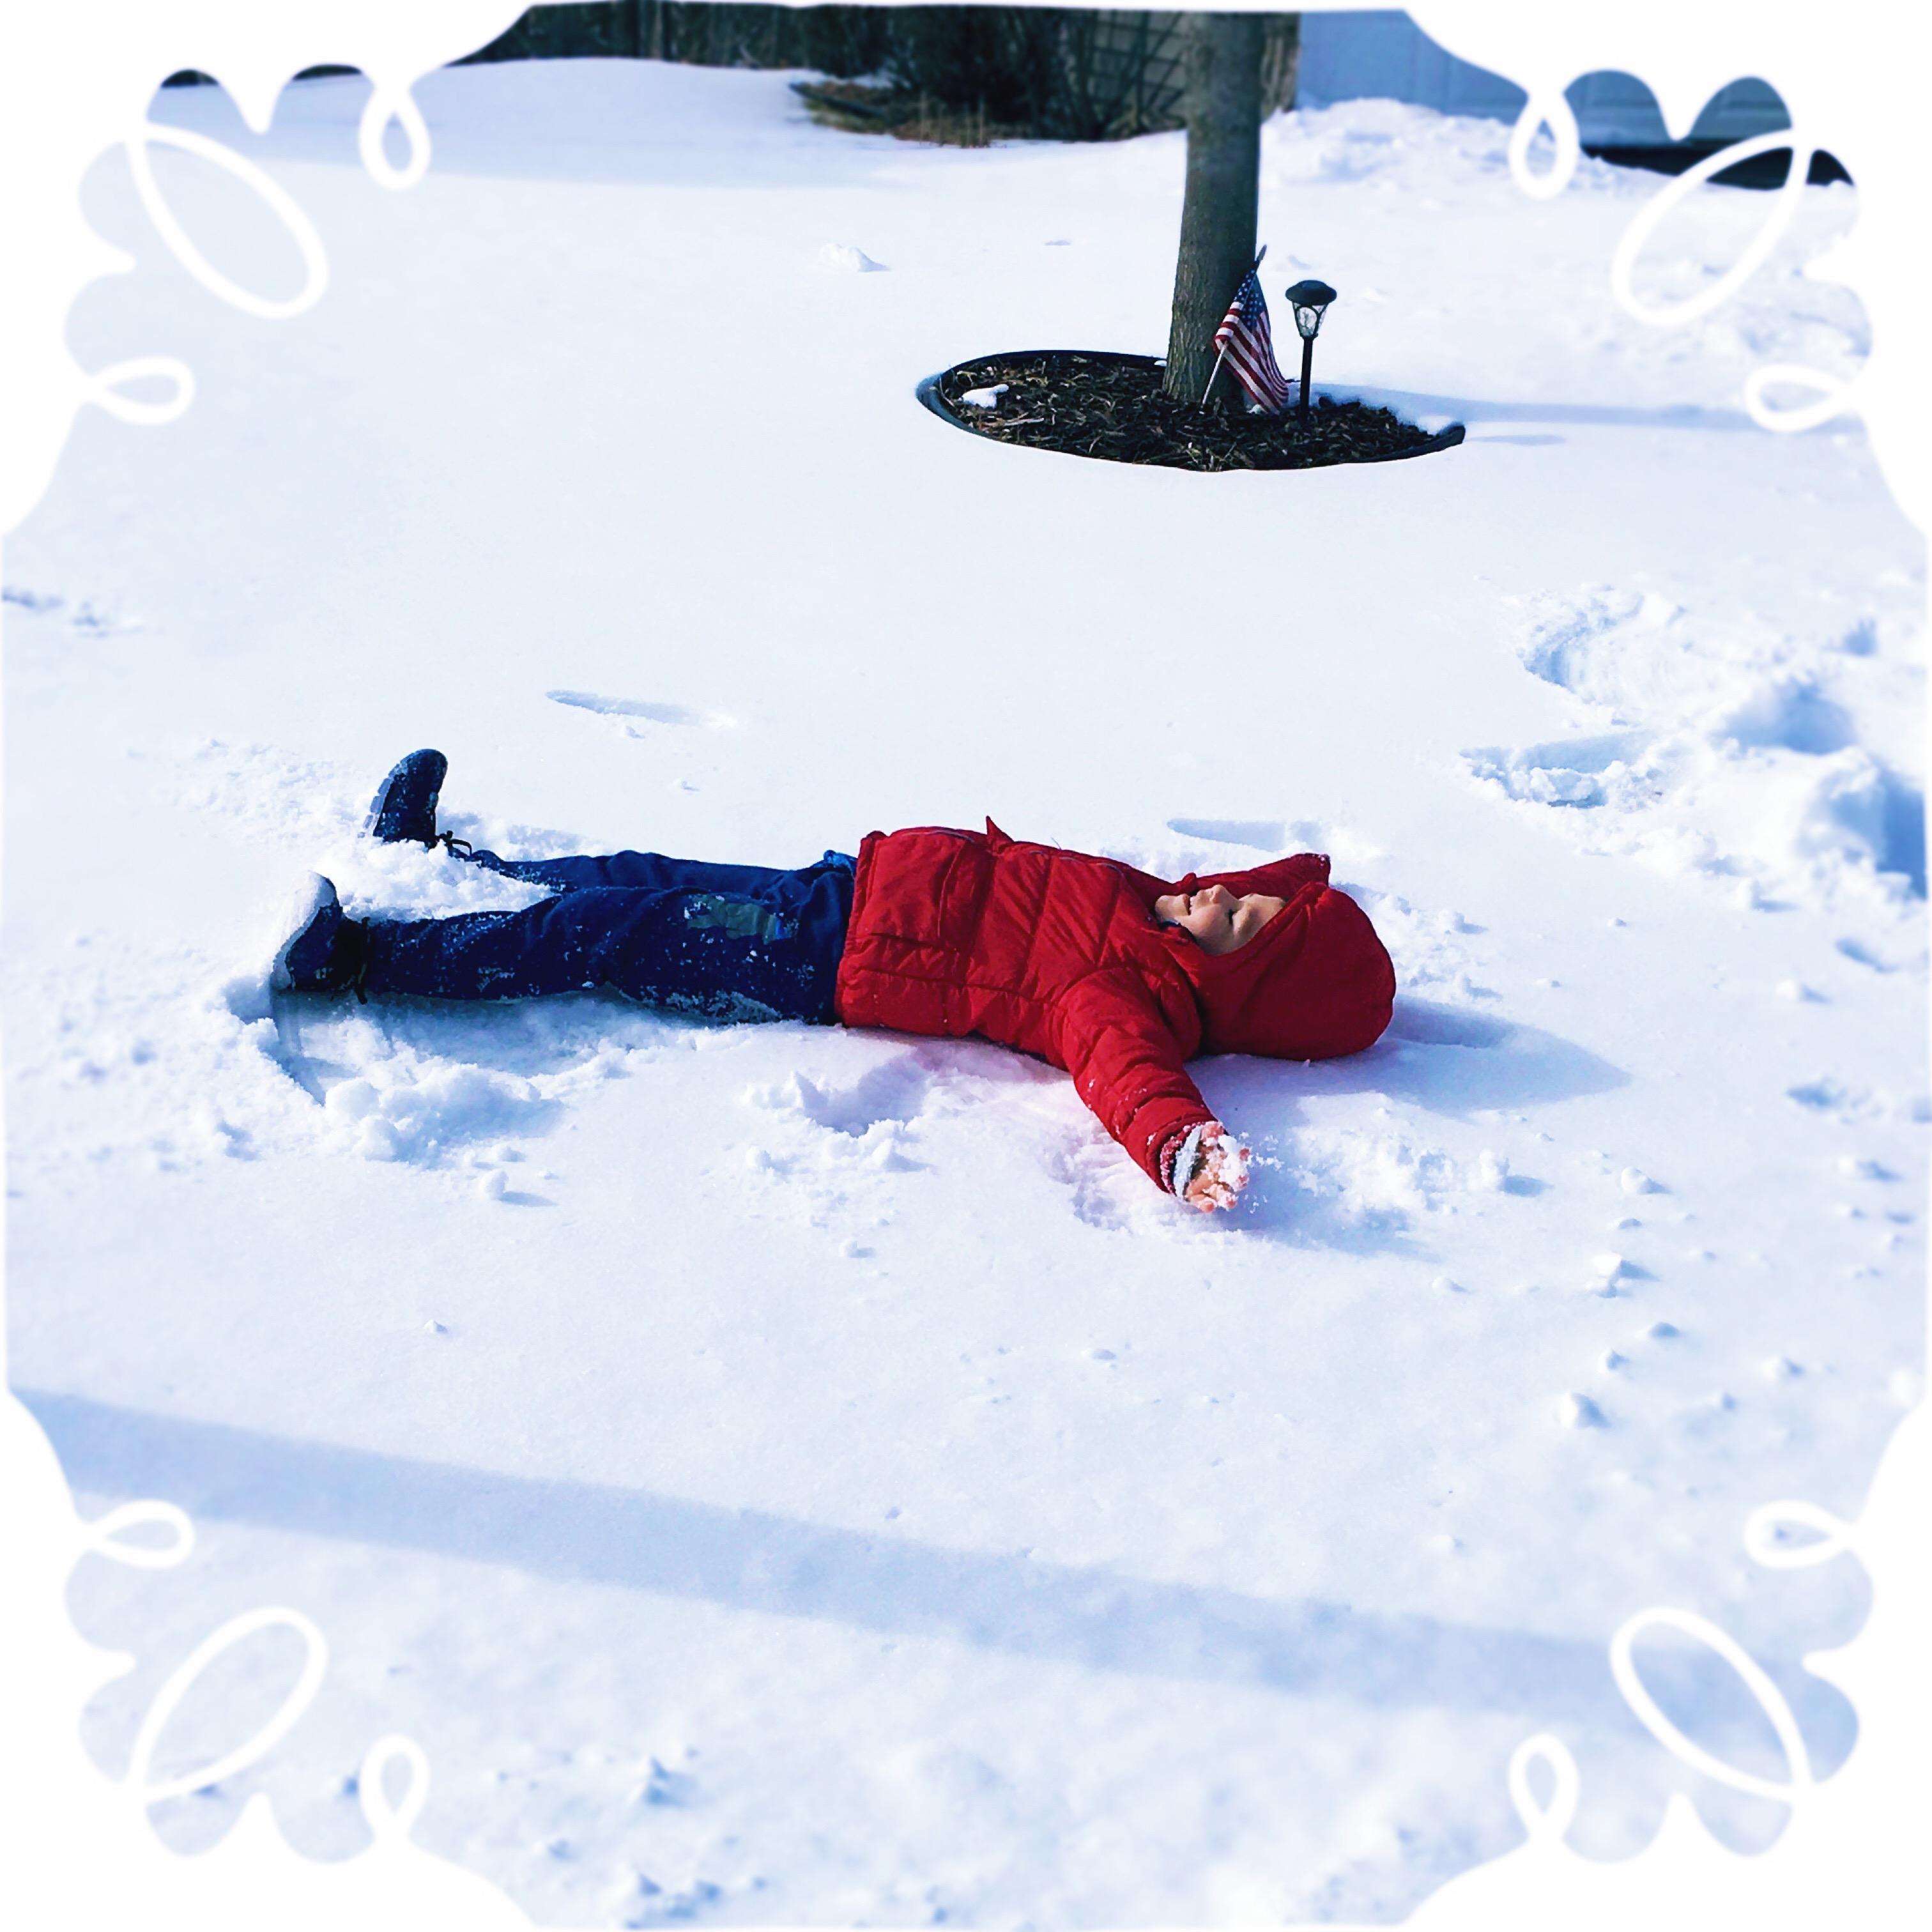 Making Snow Angles